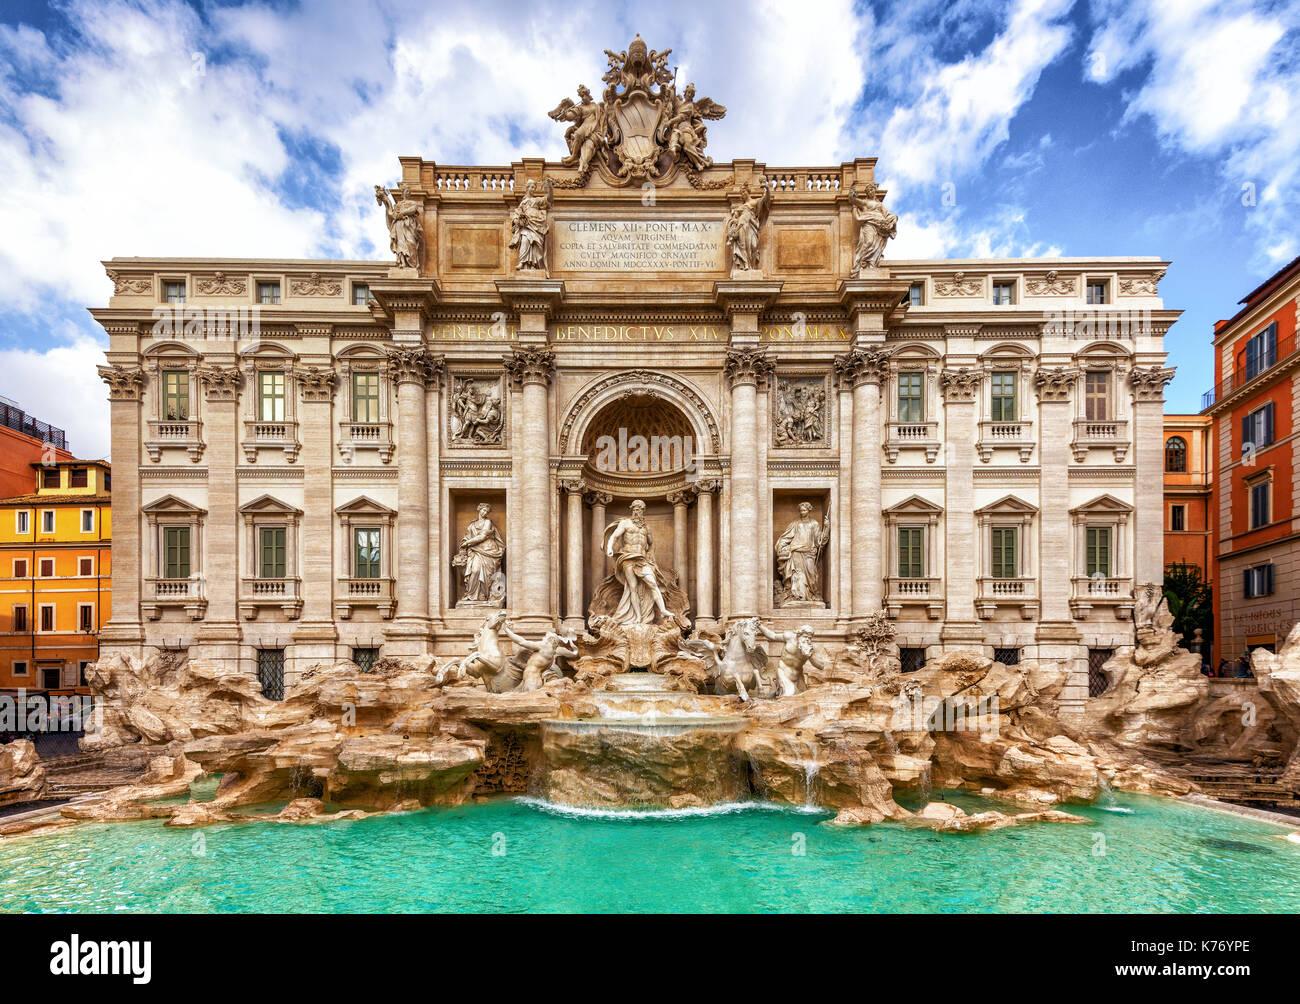 Fontana di Trevi. Große Szene mit allen des Gebäudes ist im Rahmen. Stockbild